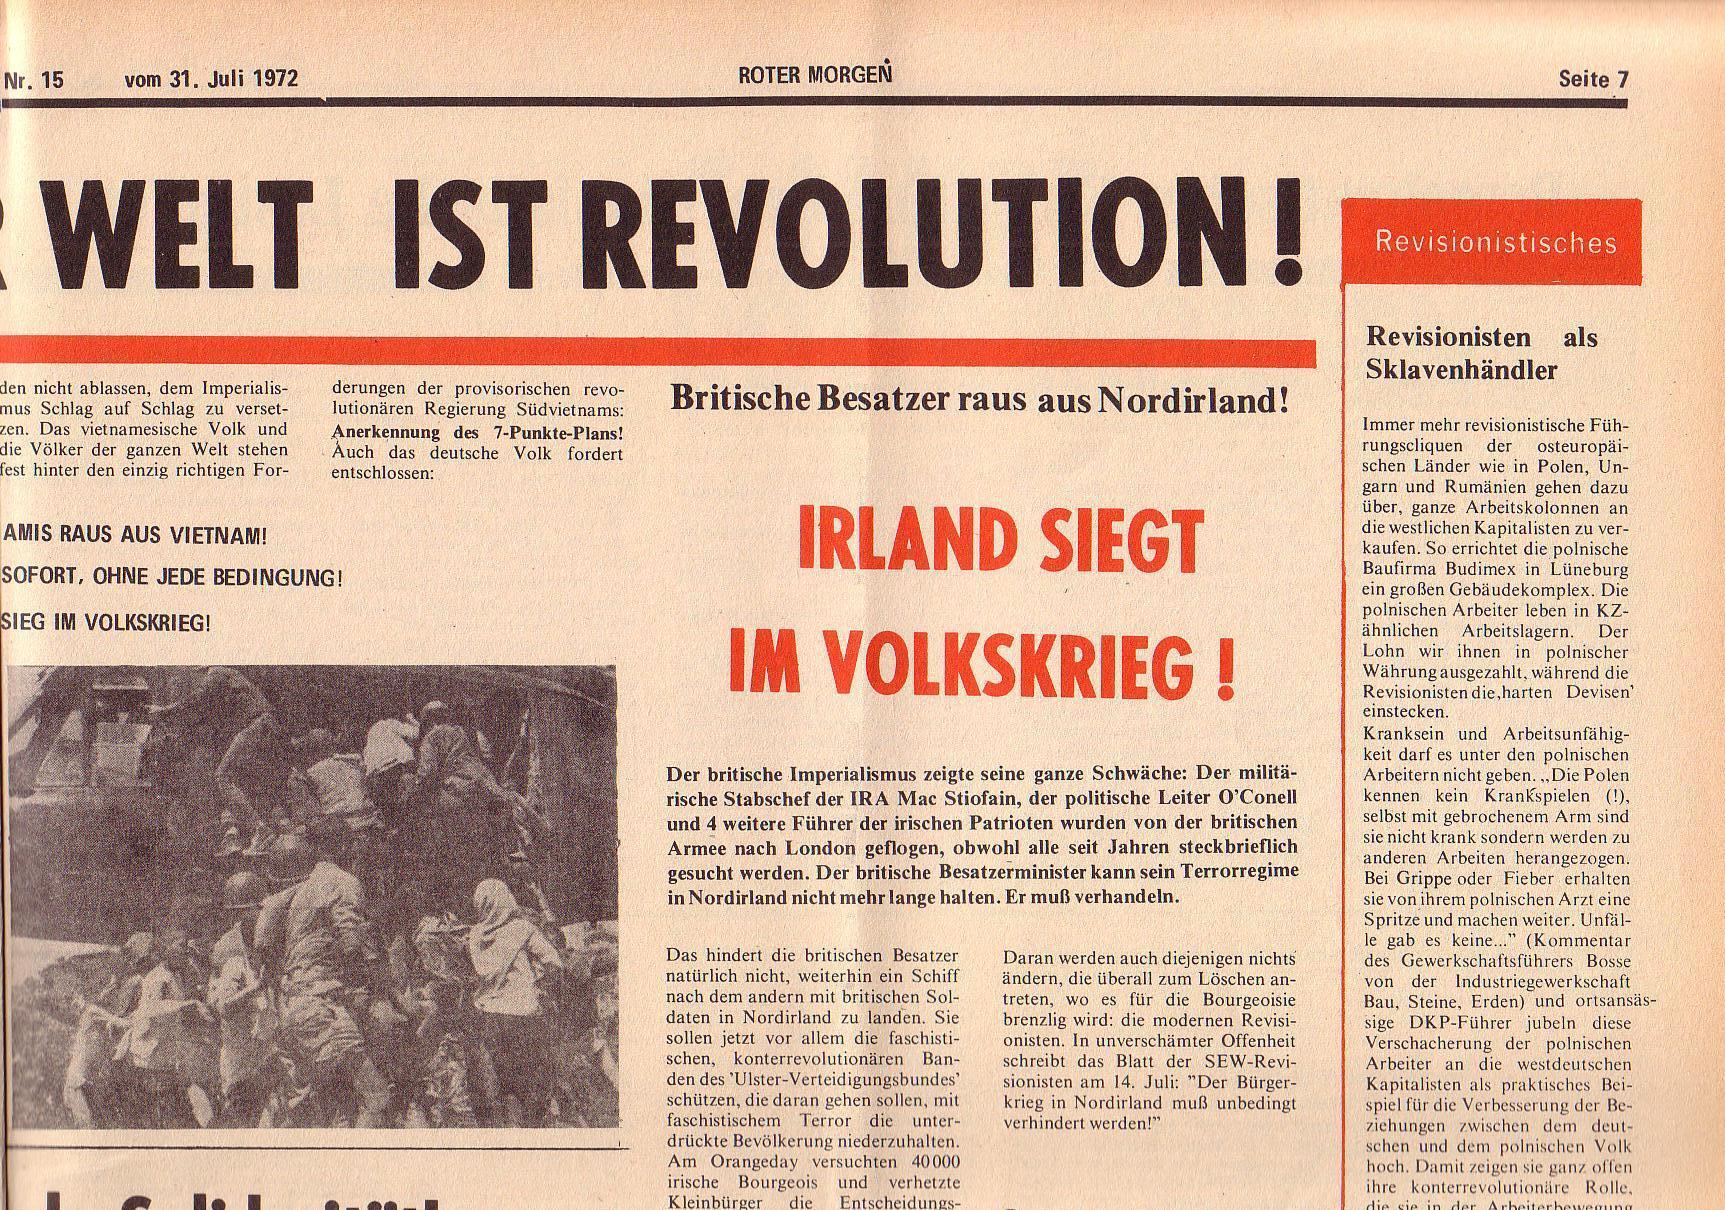 Roter Morgen, 6. Jg., 31. Juli 1972, Nr. 15, Seite 7a